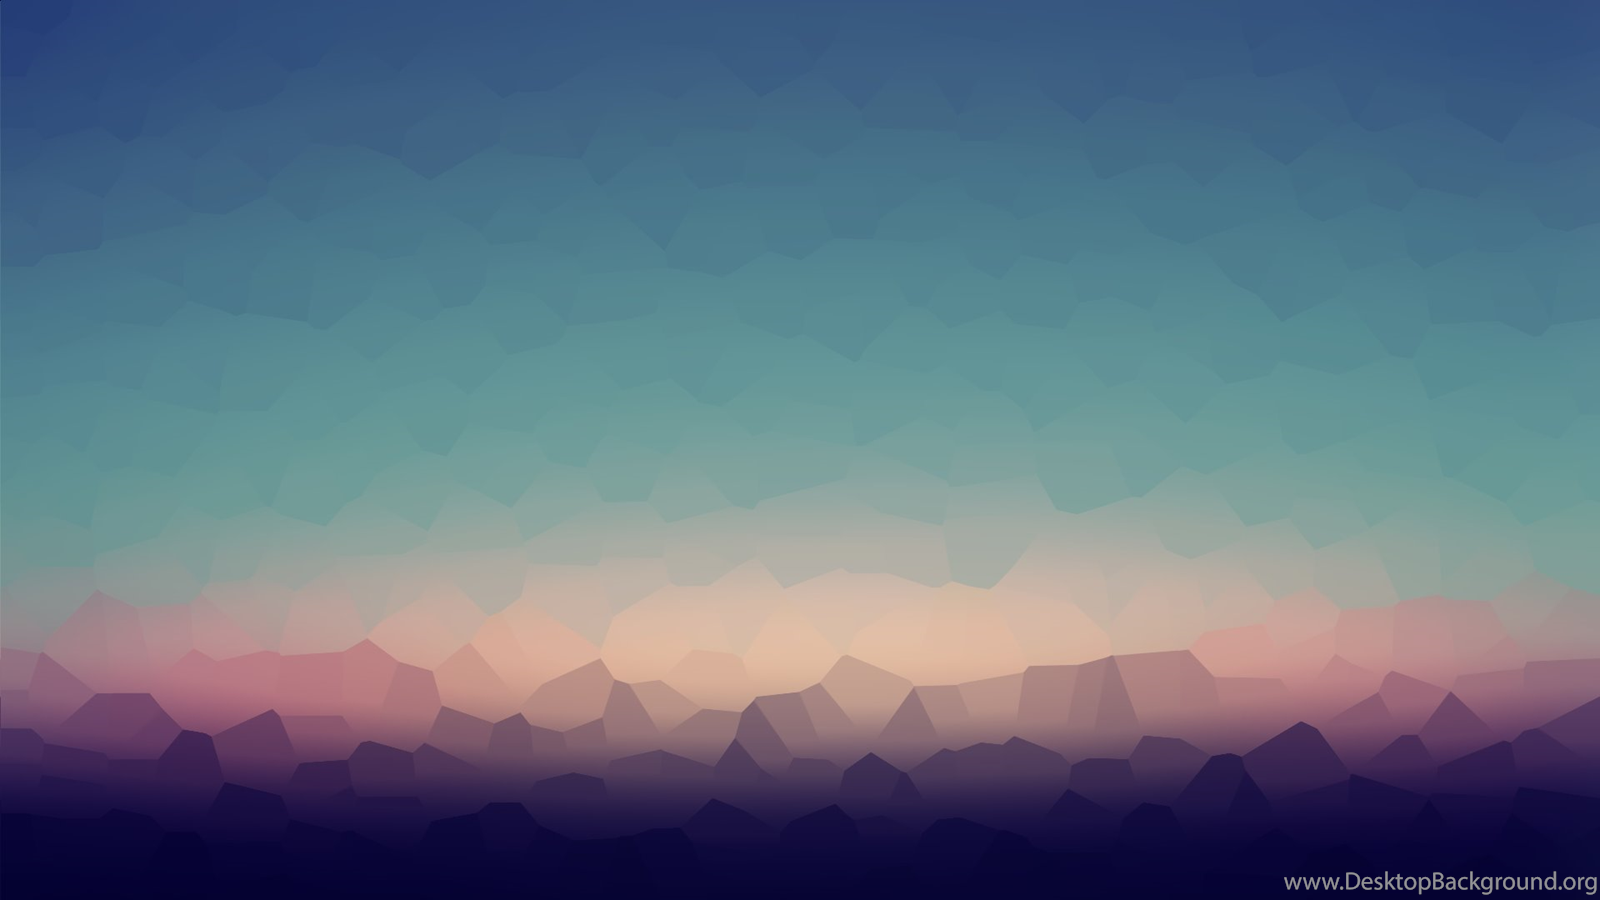 Art Wallpaper Hd For Mobile 23: Digital Art, Simple Backgrounds Wallpapers HD / Desktop